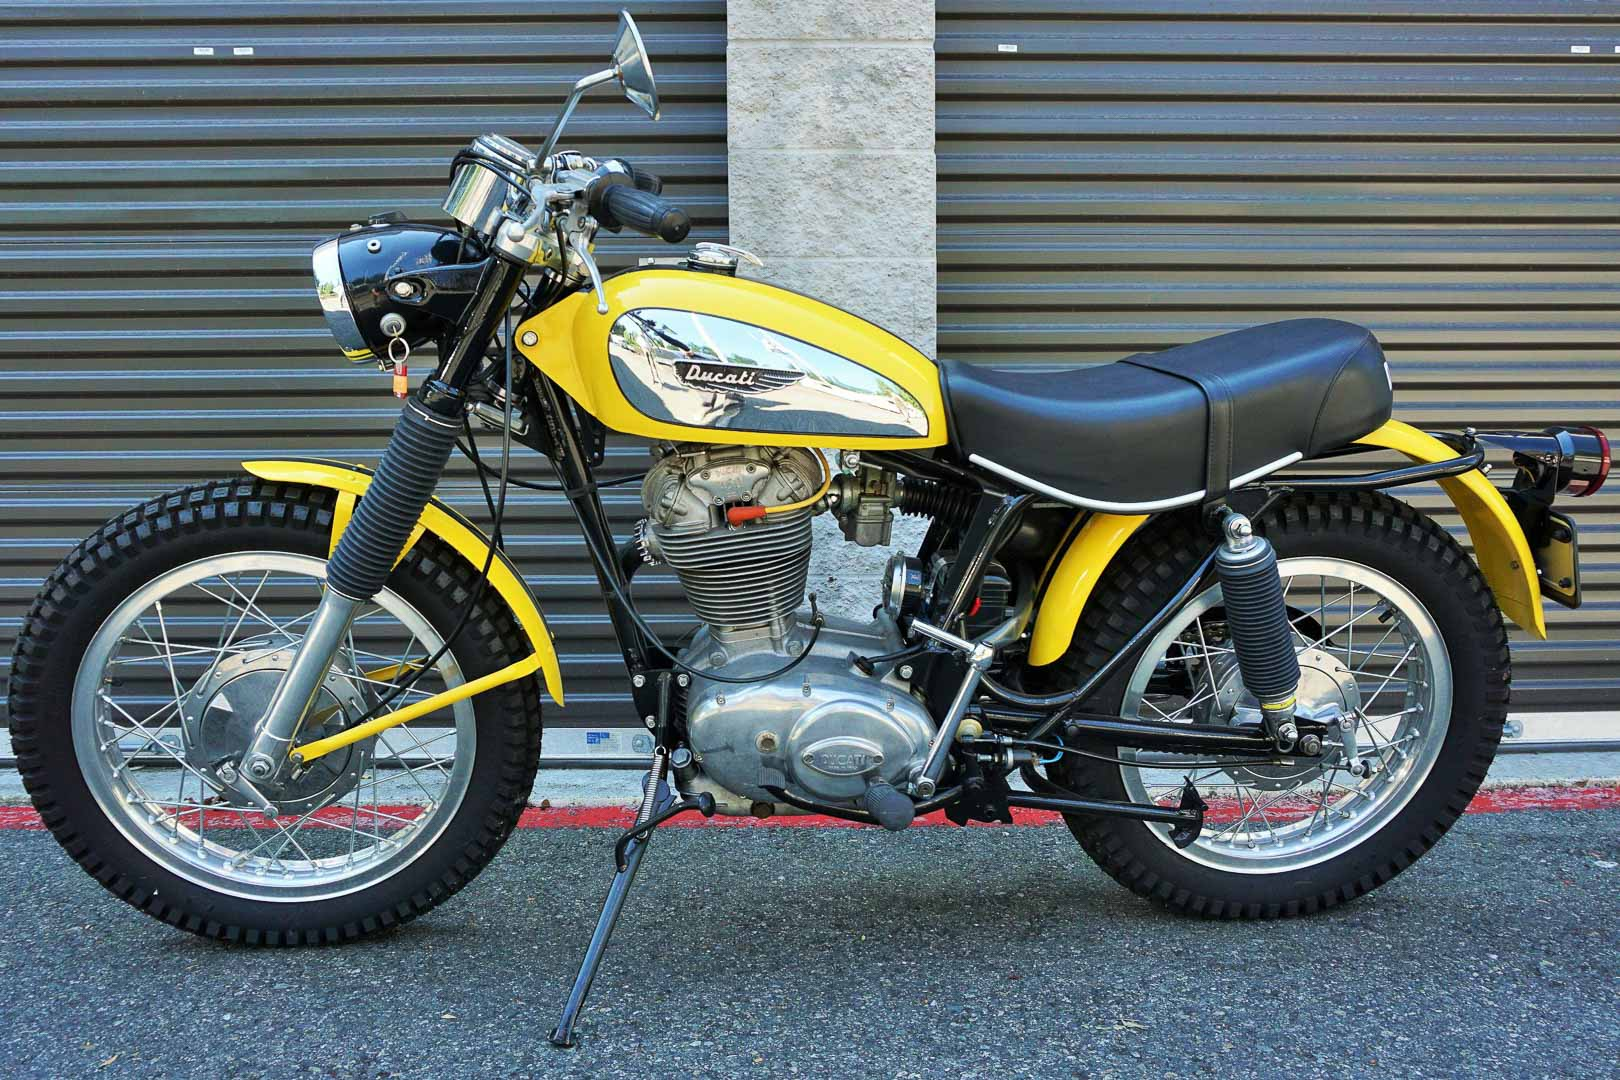 1970 Ducati Jupiter 450 Scrambler